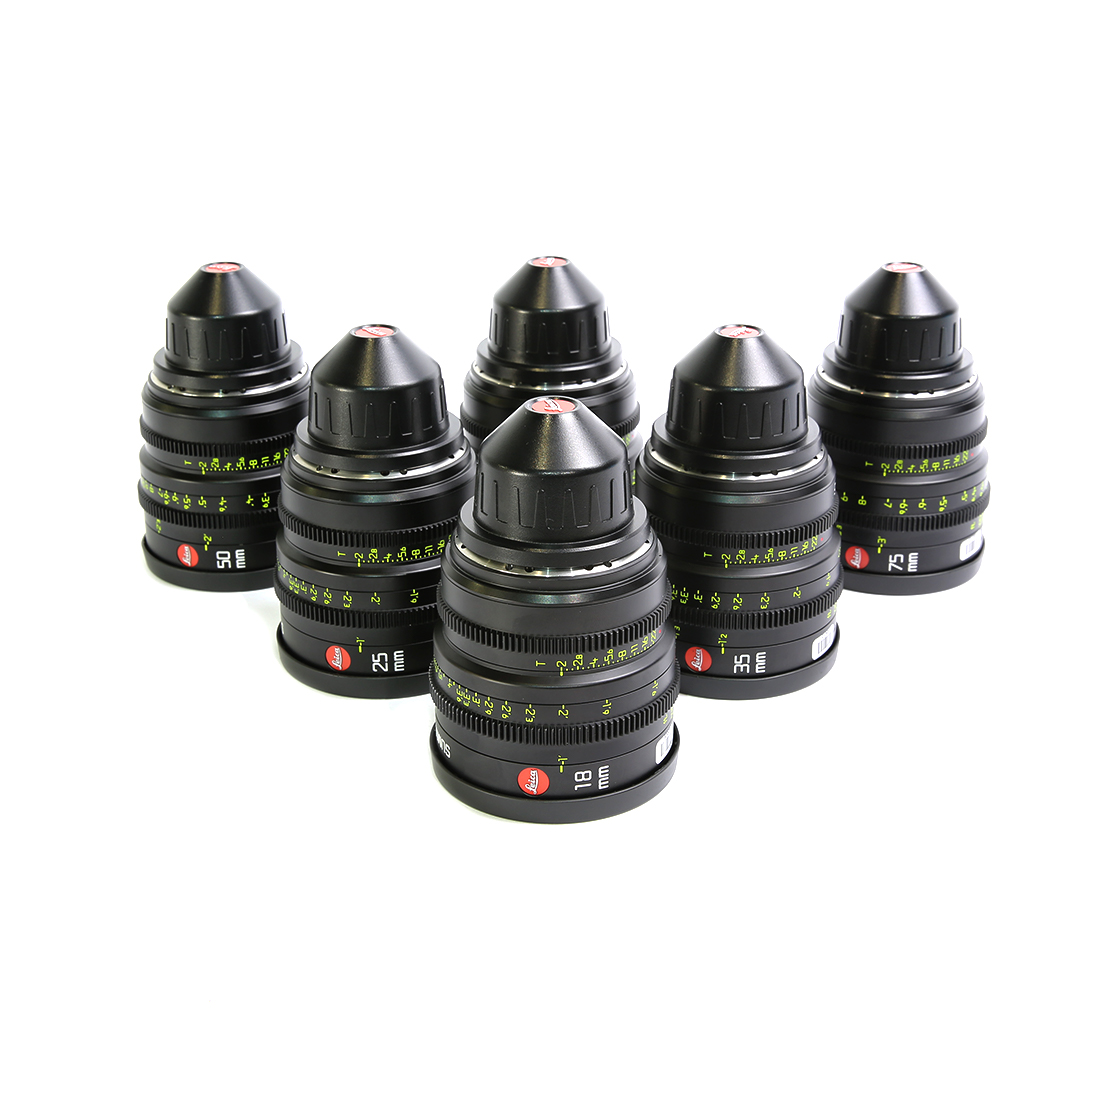 Leica Summicron-C Primes